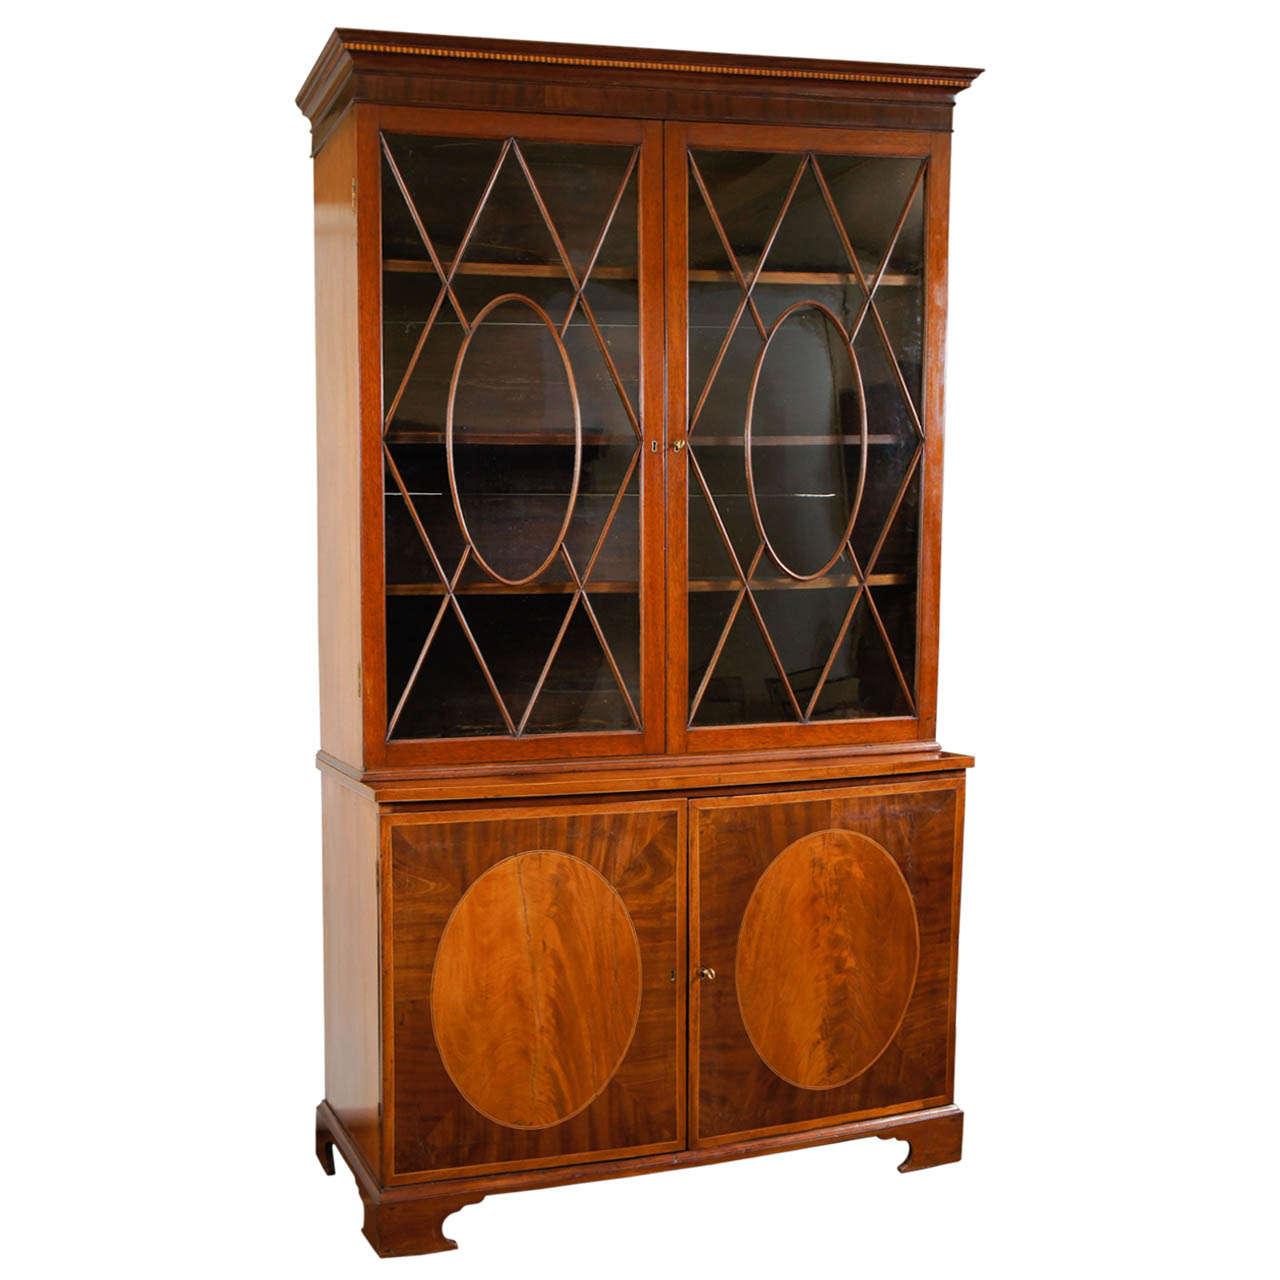 George III Mahogany Bookcase Cabinet, England, circa 1785